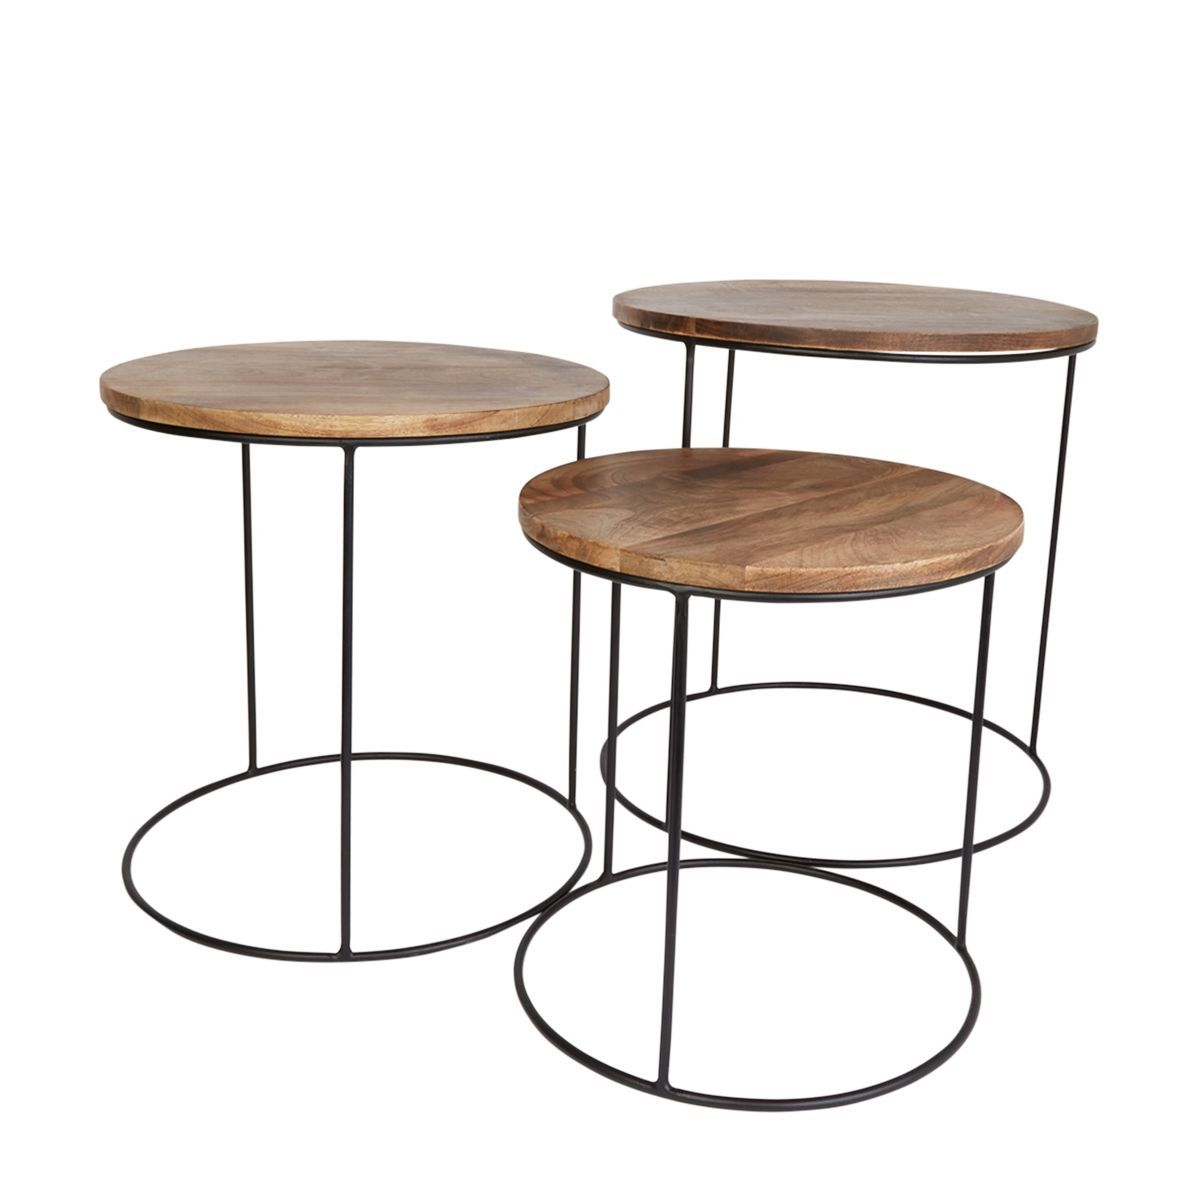 3 Tables Basses Gigogne Omango Bois Et Metal Bois Metal Table Basse Plateau Bois